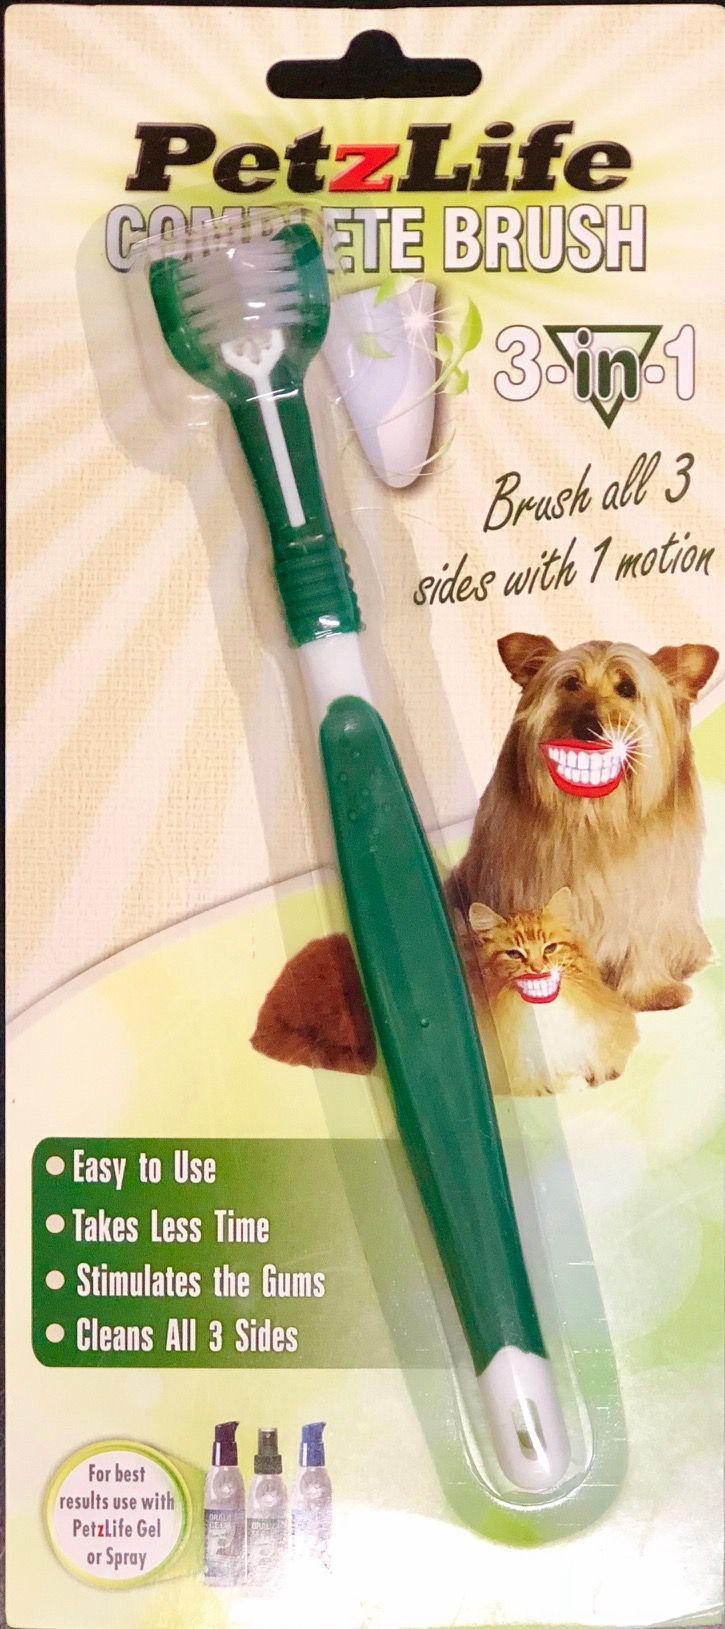 PetzLife Complete Toothbrush - Escova Cabeça Tripla